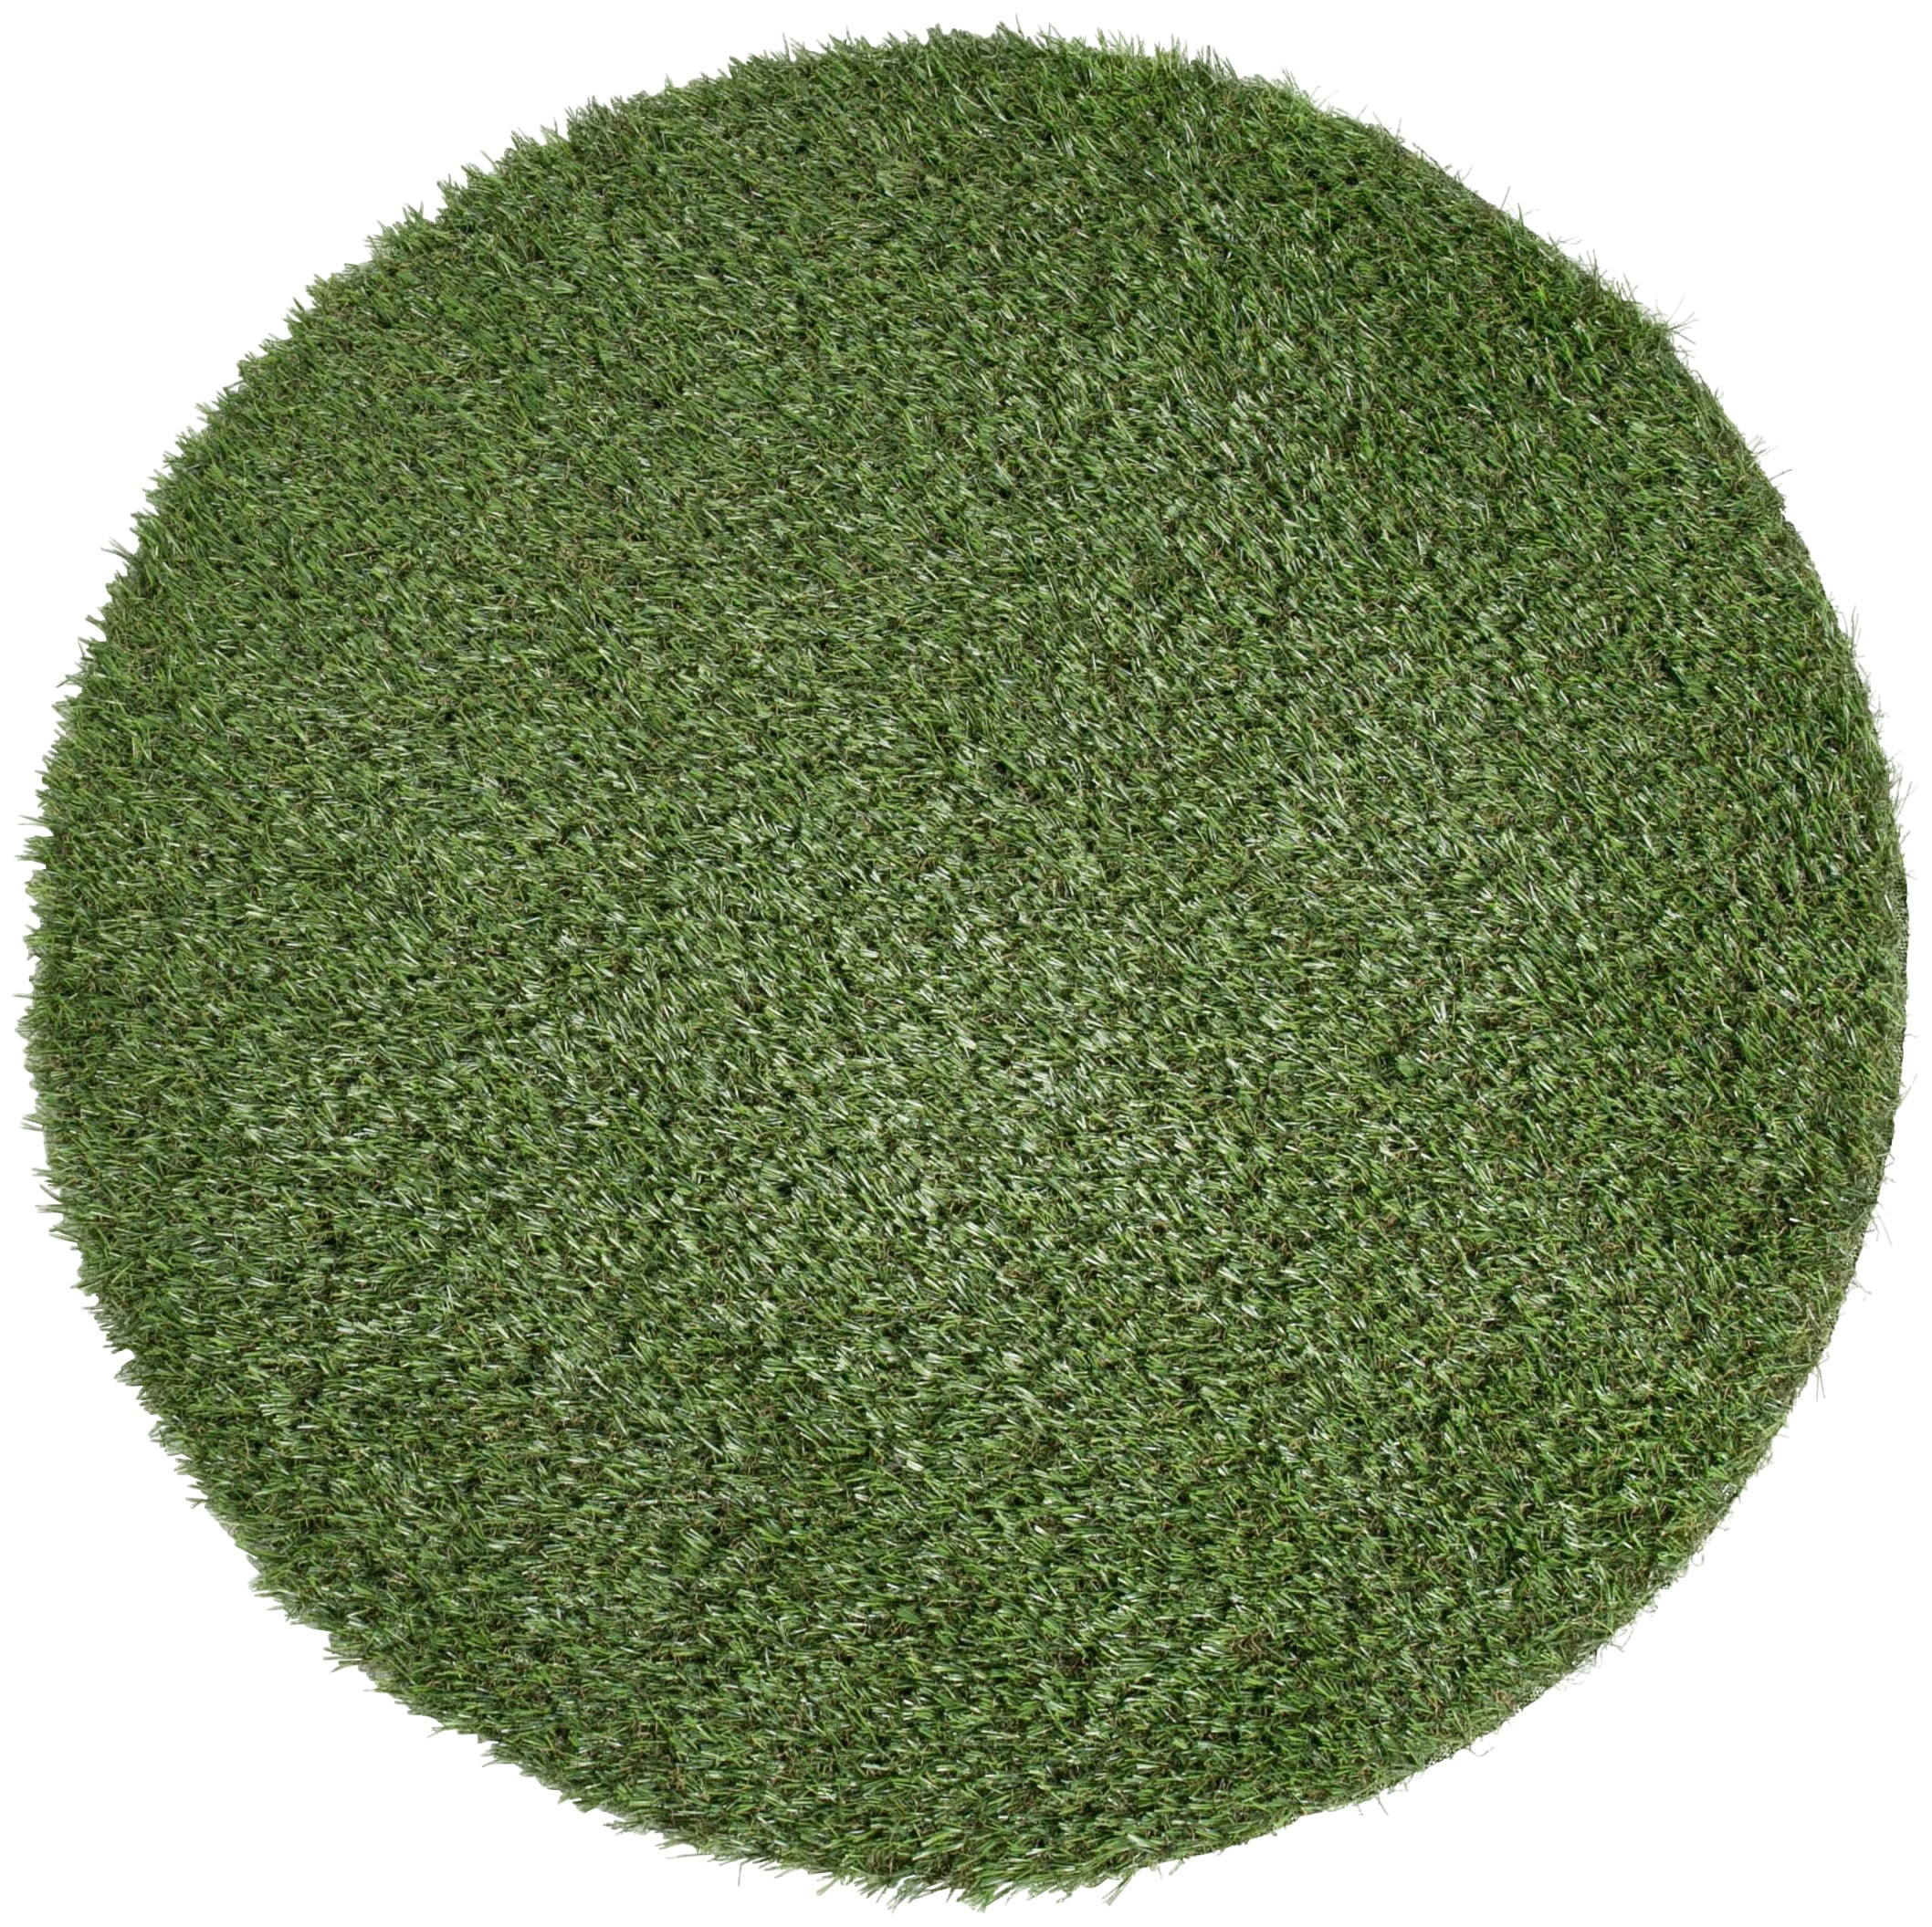 Image of ANDIAMO Kunstrasen »Sansibar«, Ø 133 cm, grün